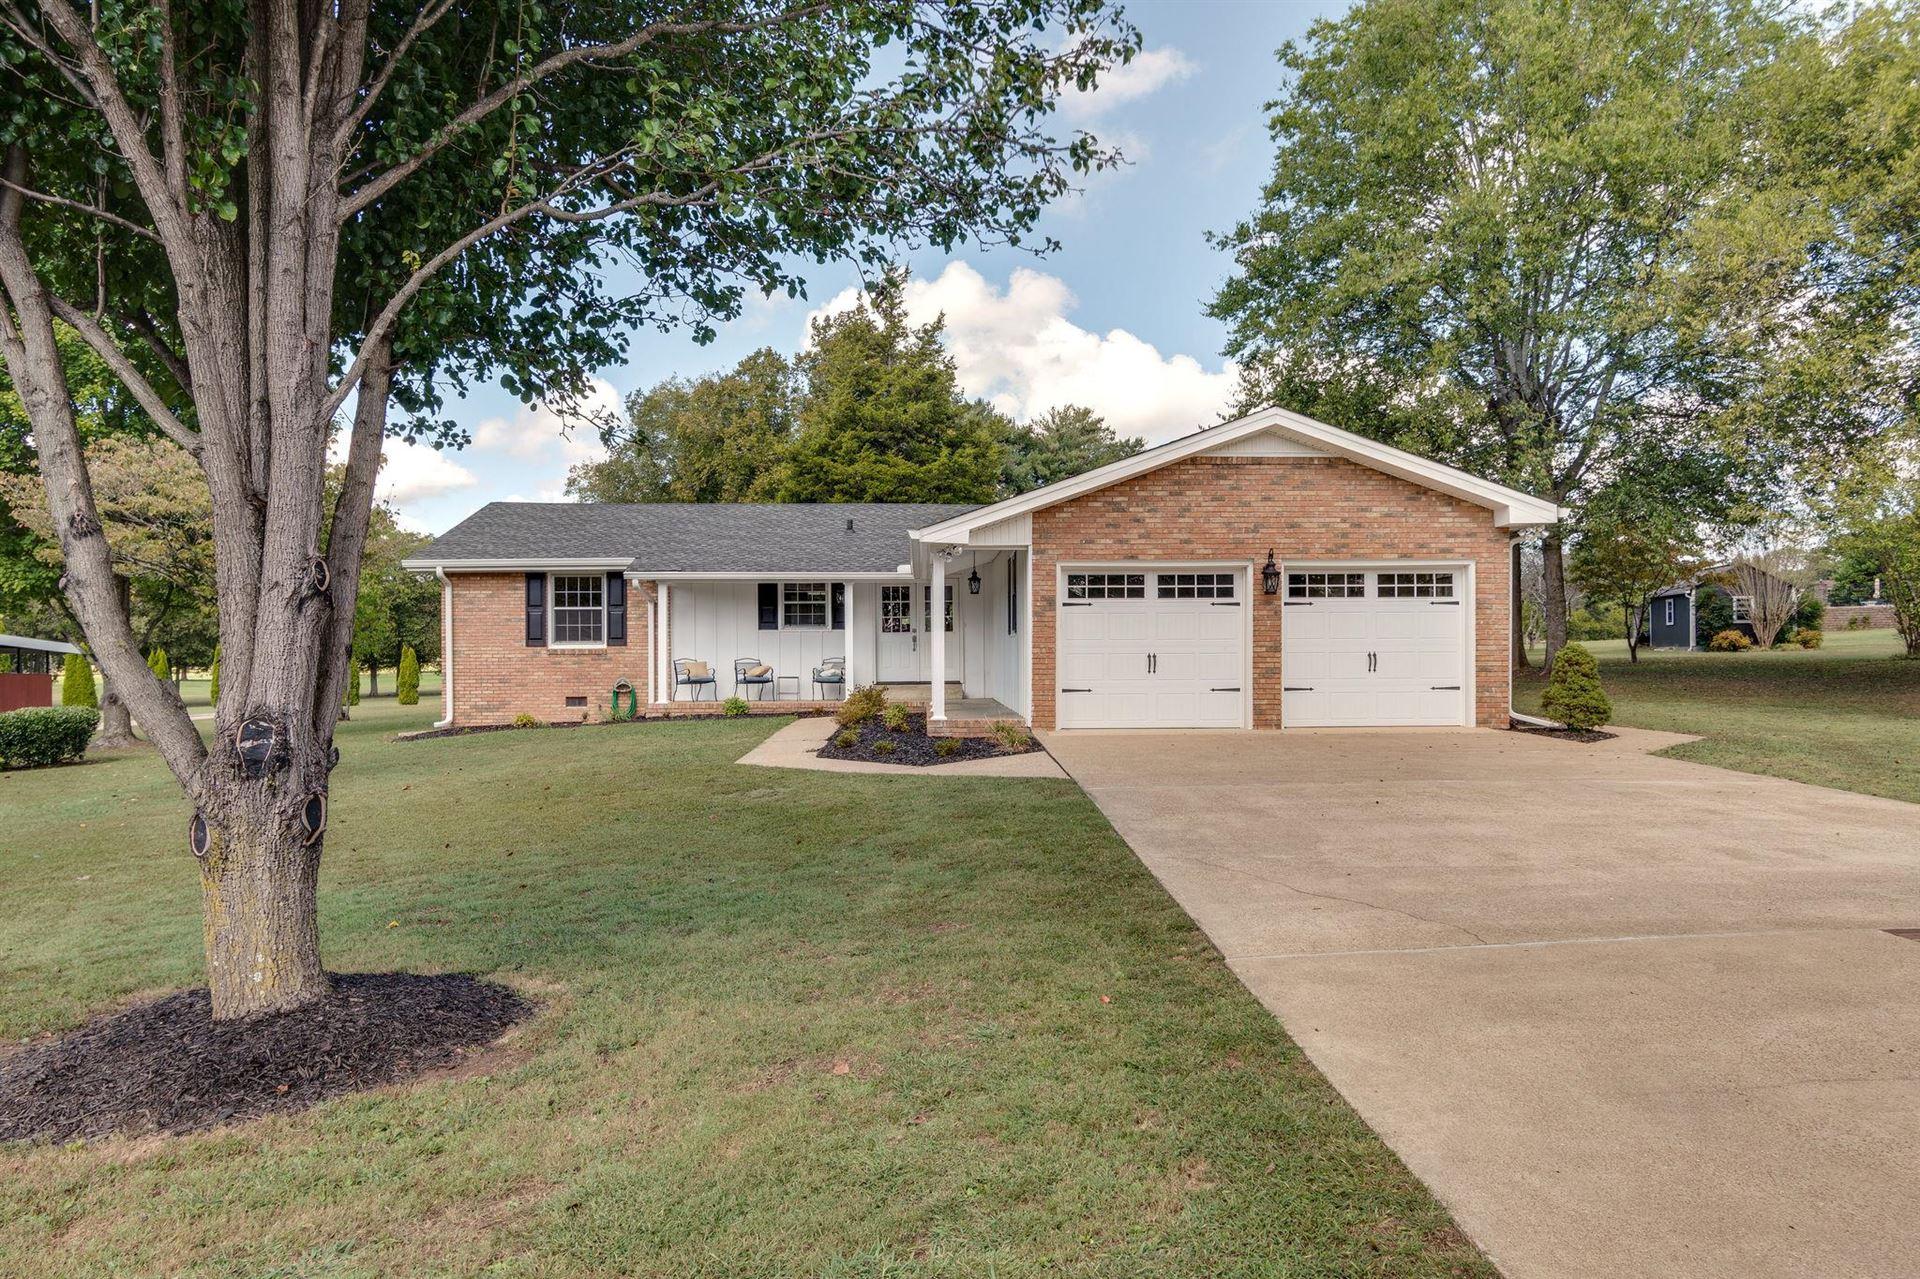 404 Manor Cir, Lewisburg, TN 37091 - MLS#: 2090623